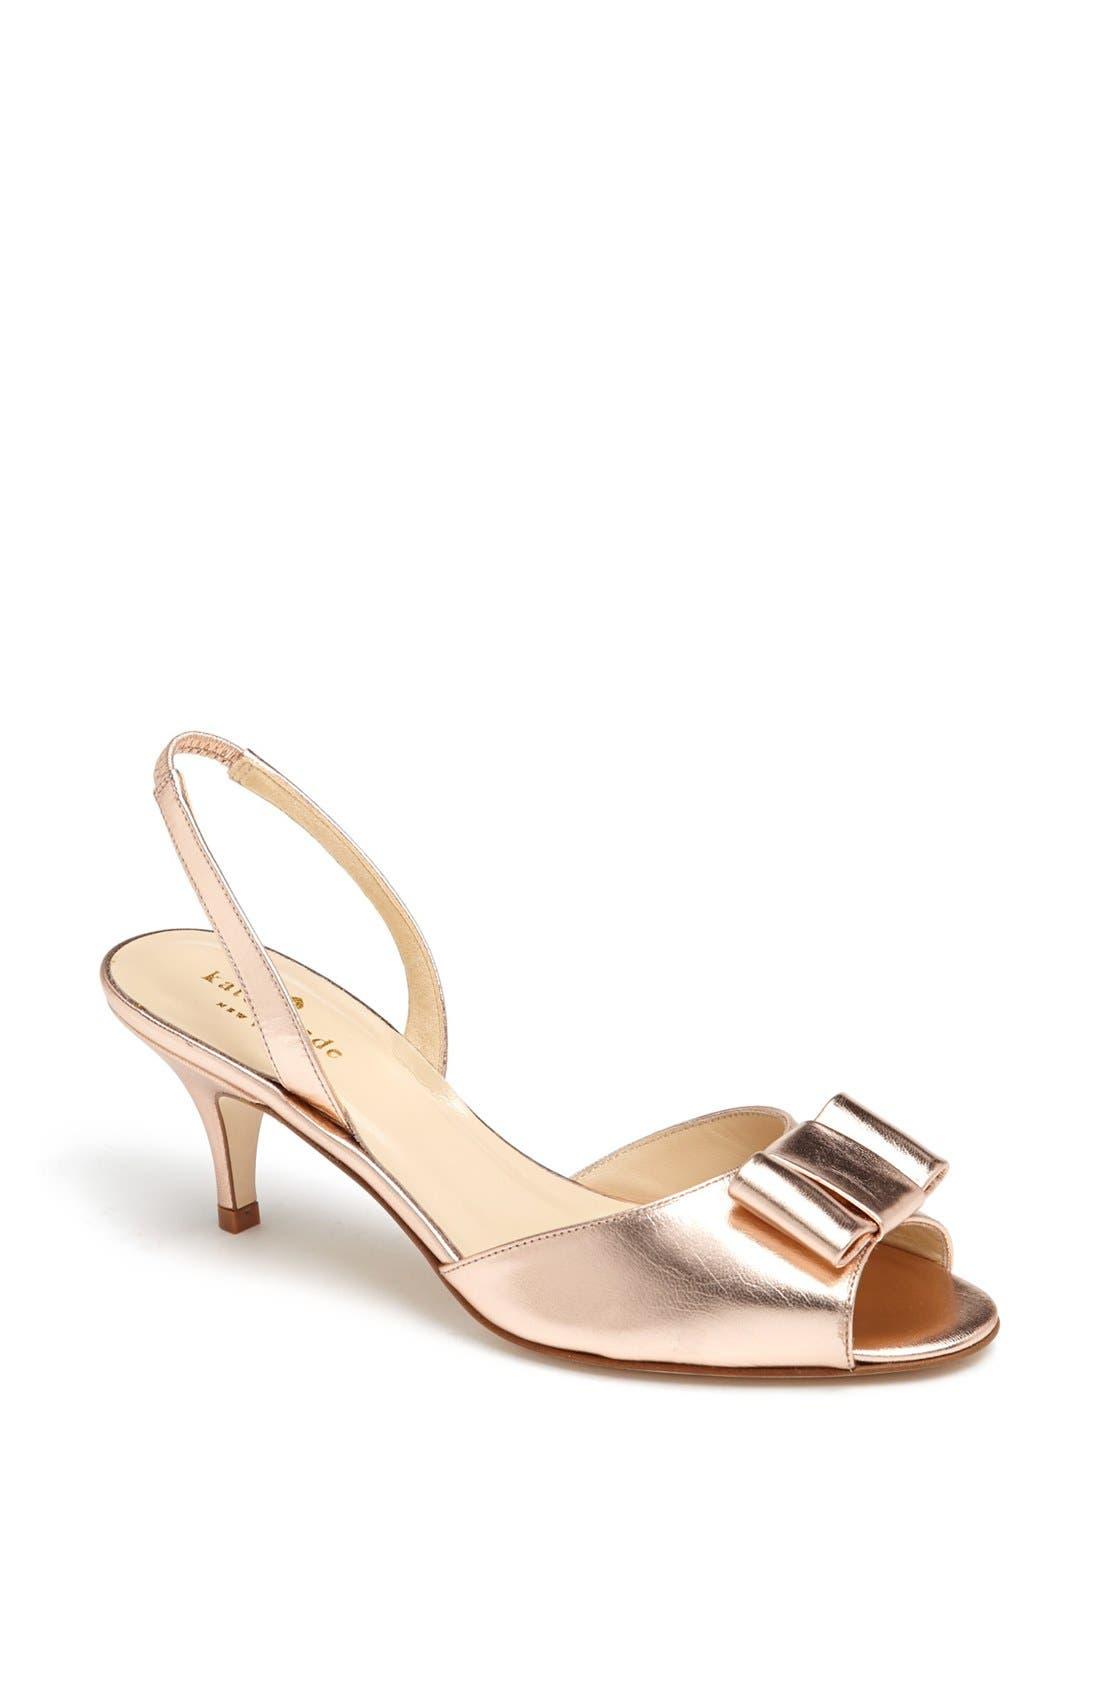 Alternate Image 1 Selected - kate spade new york 'emelia' sandal